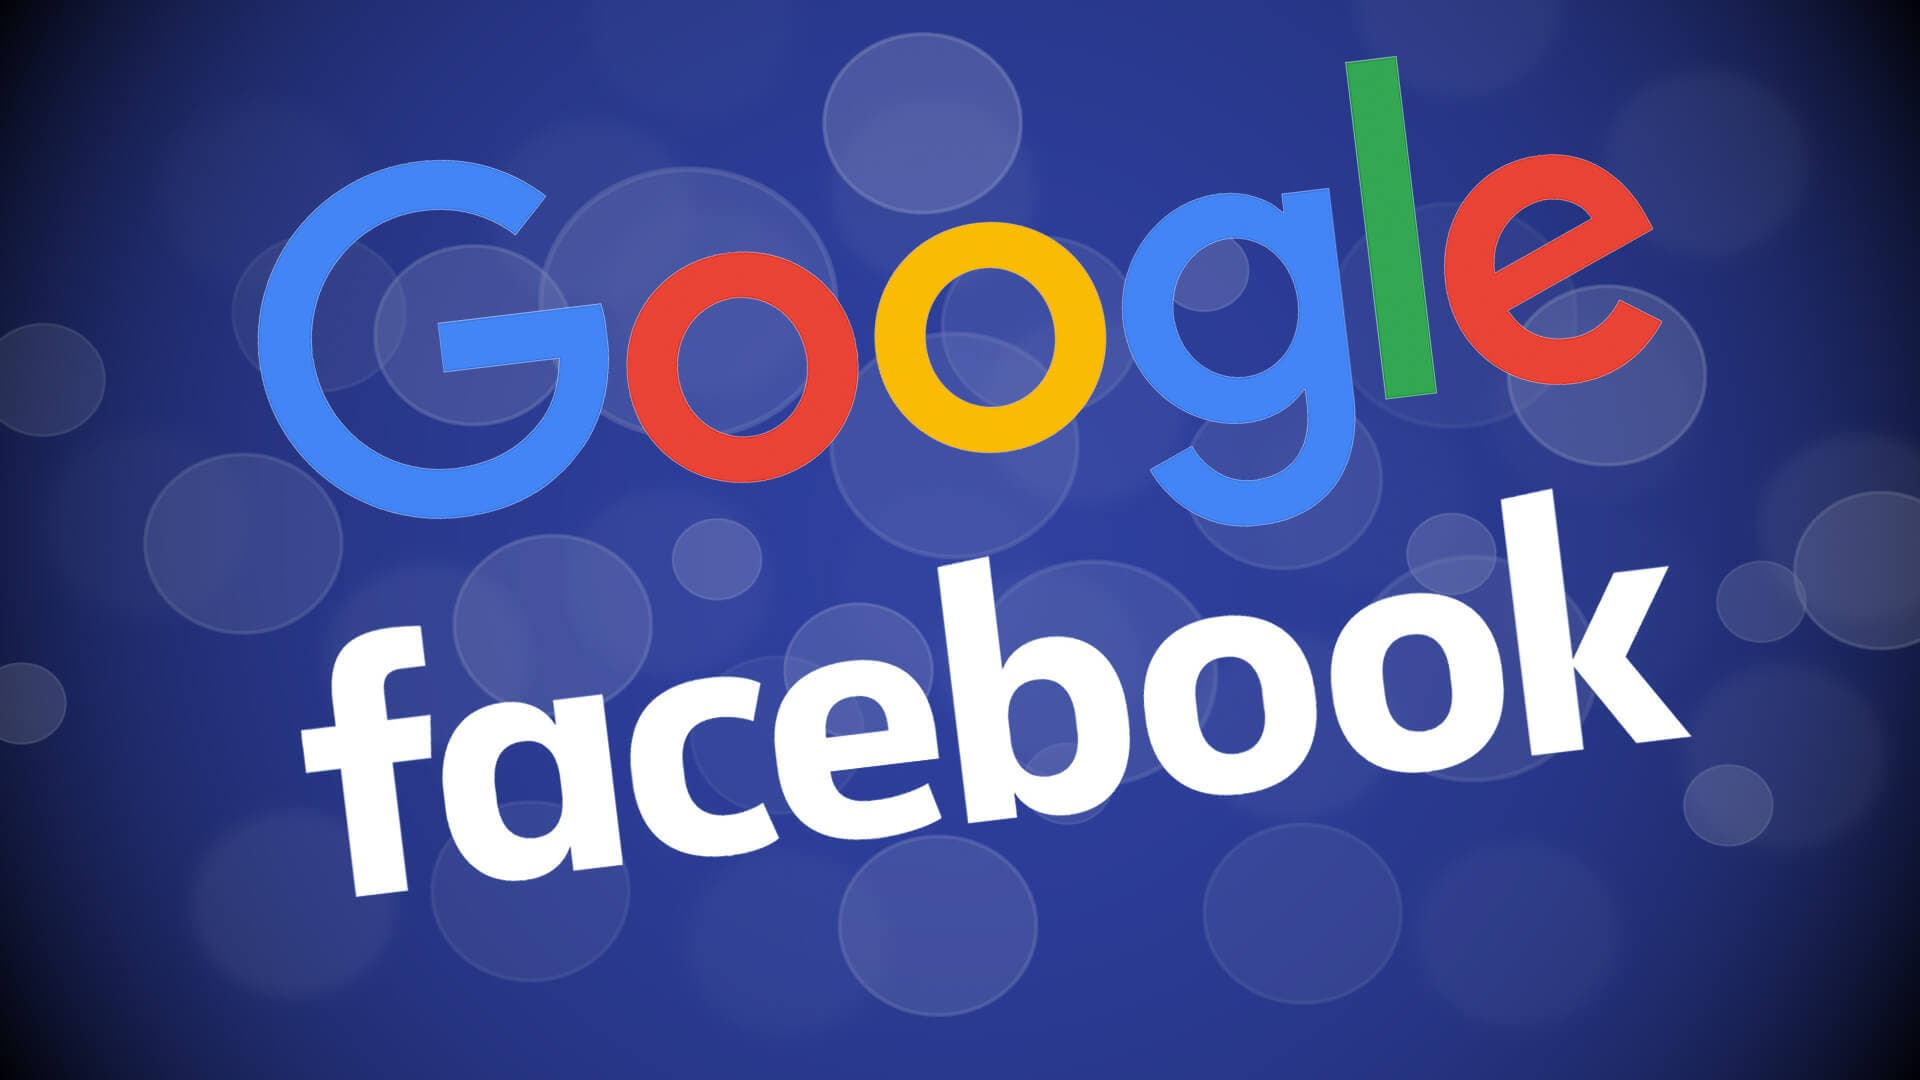 Google and Facebook logos. (Supplied)